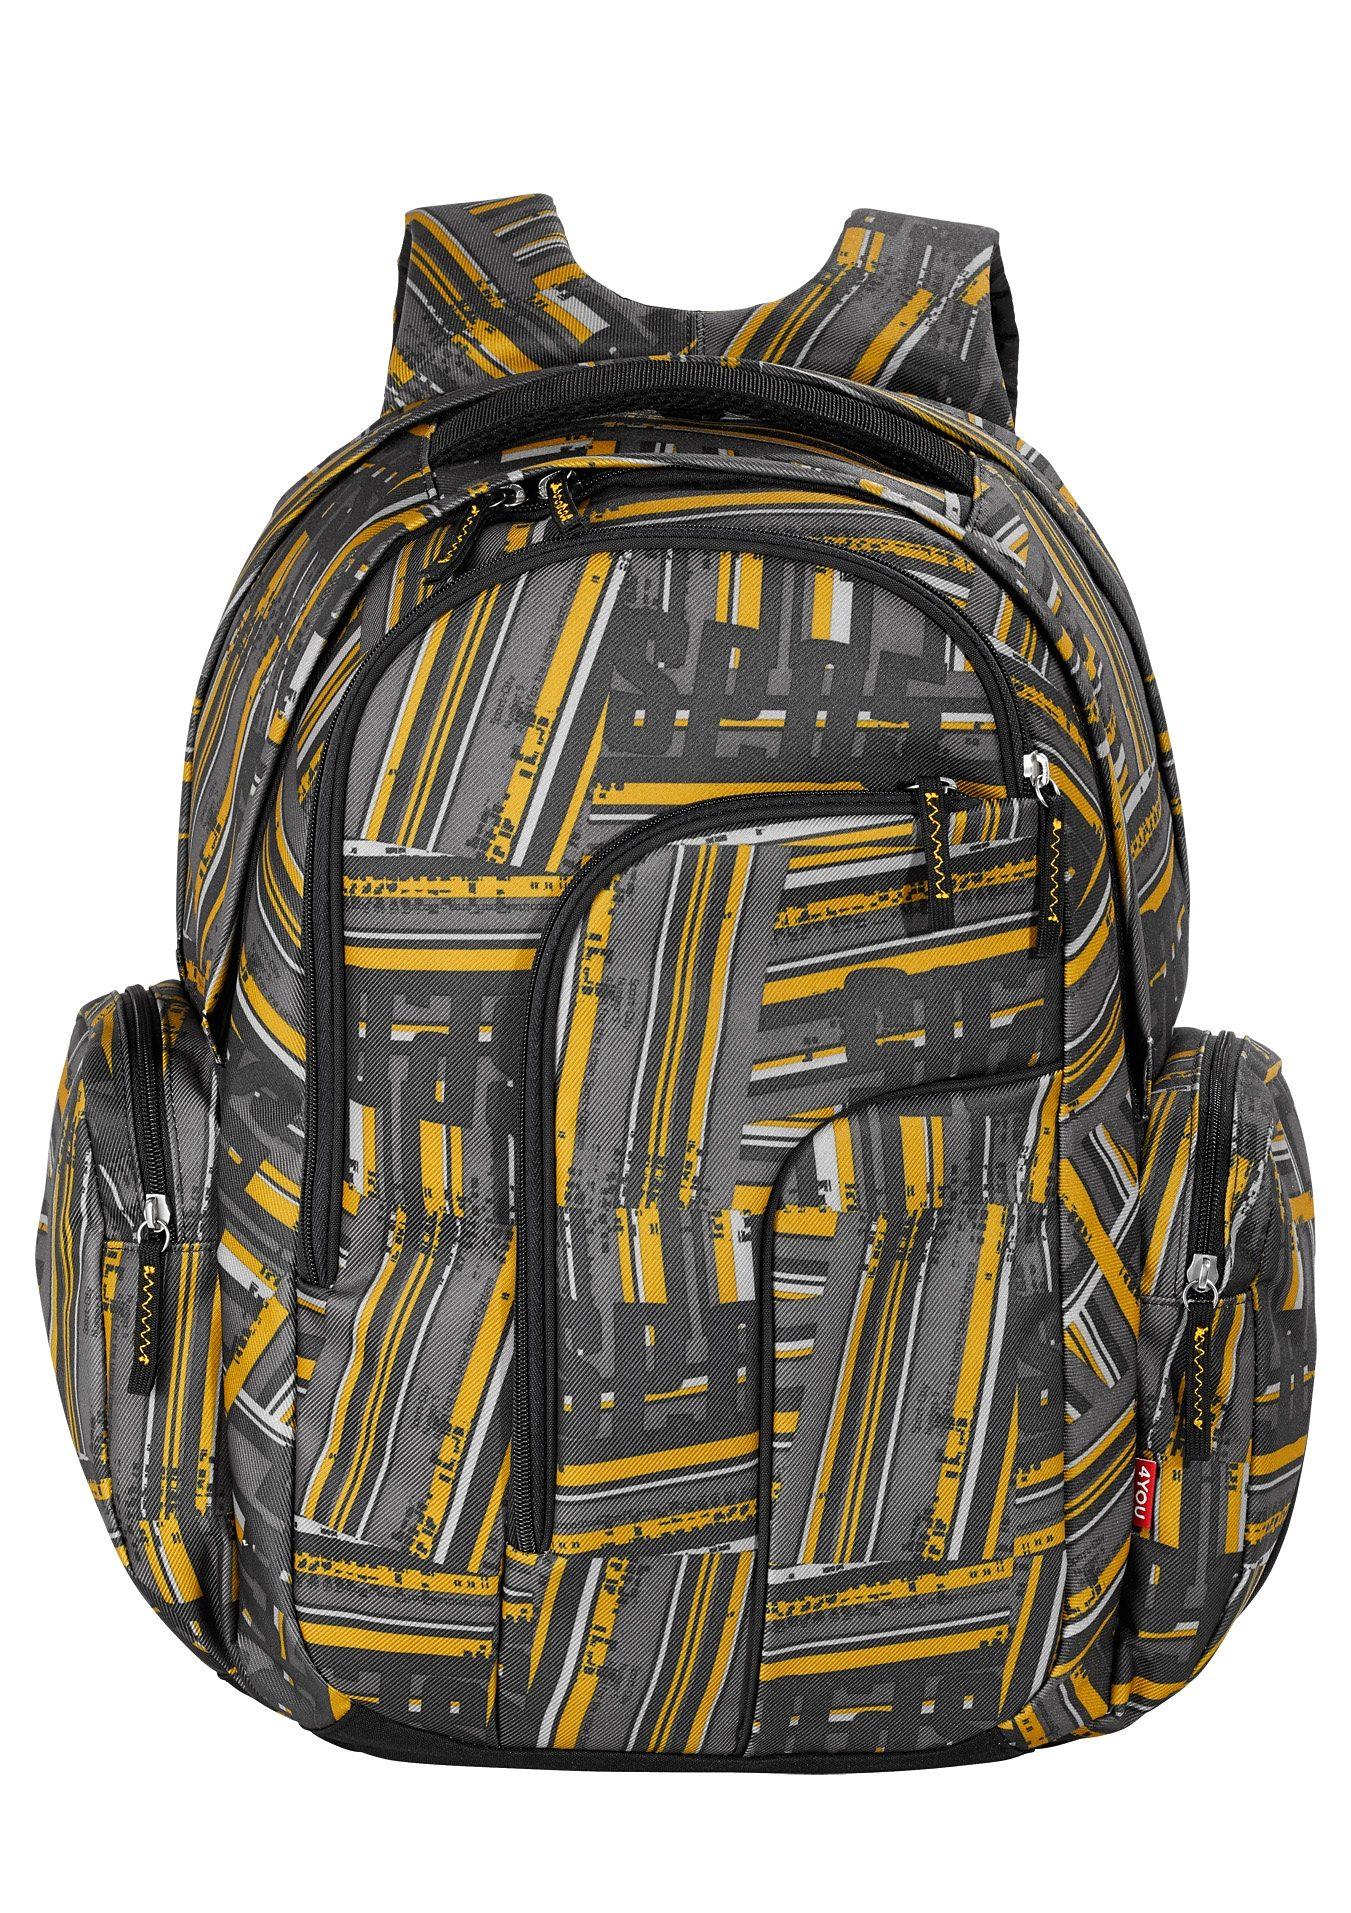 4YOU Schulrucksack mit Laptopfach, Stripes, »Move«